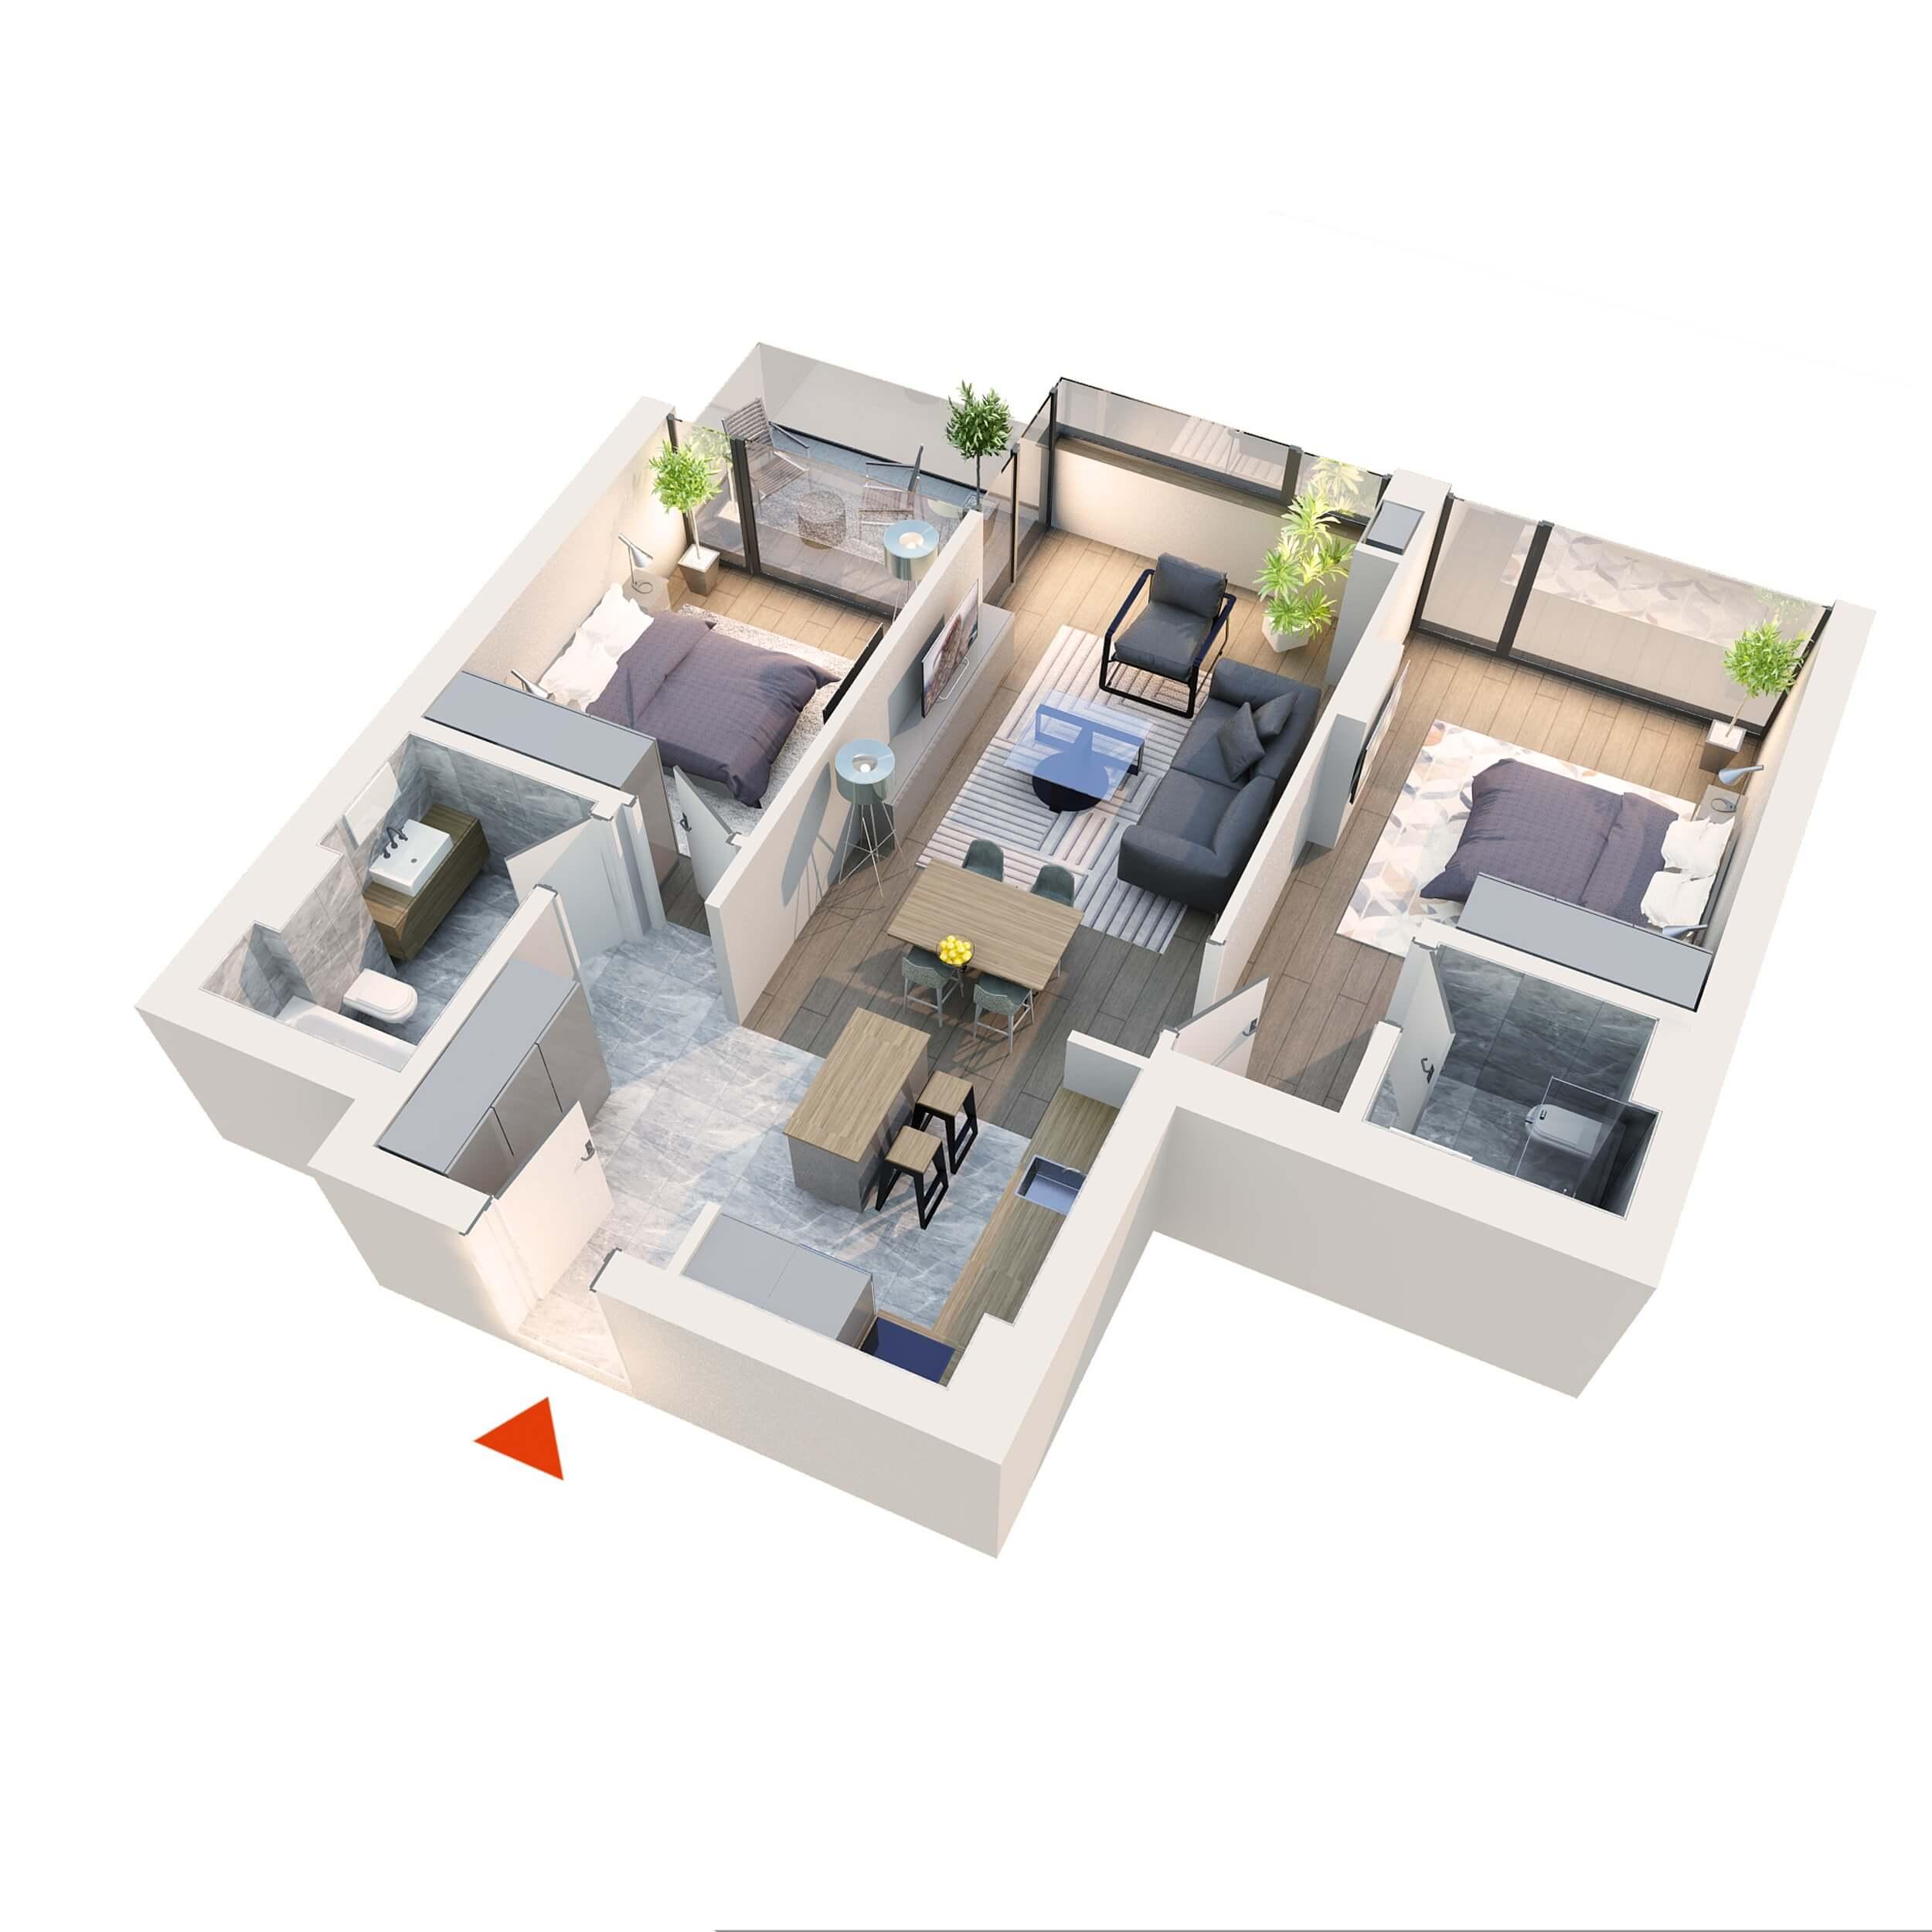 Apartament 3 camere tip 3D4 | Balcon | Etaj 1 – 5 | Corp C7 C8 | Faza 2